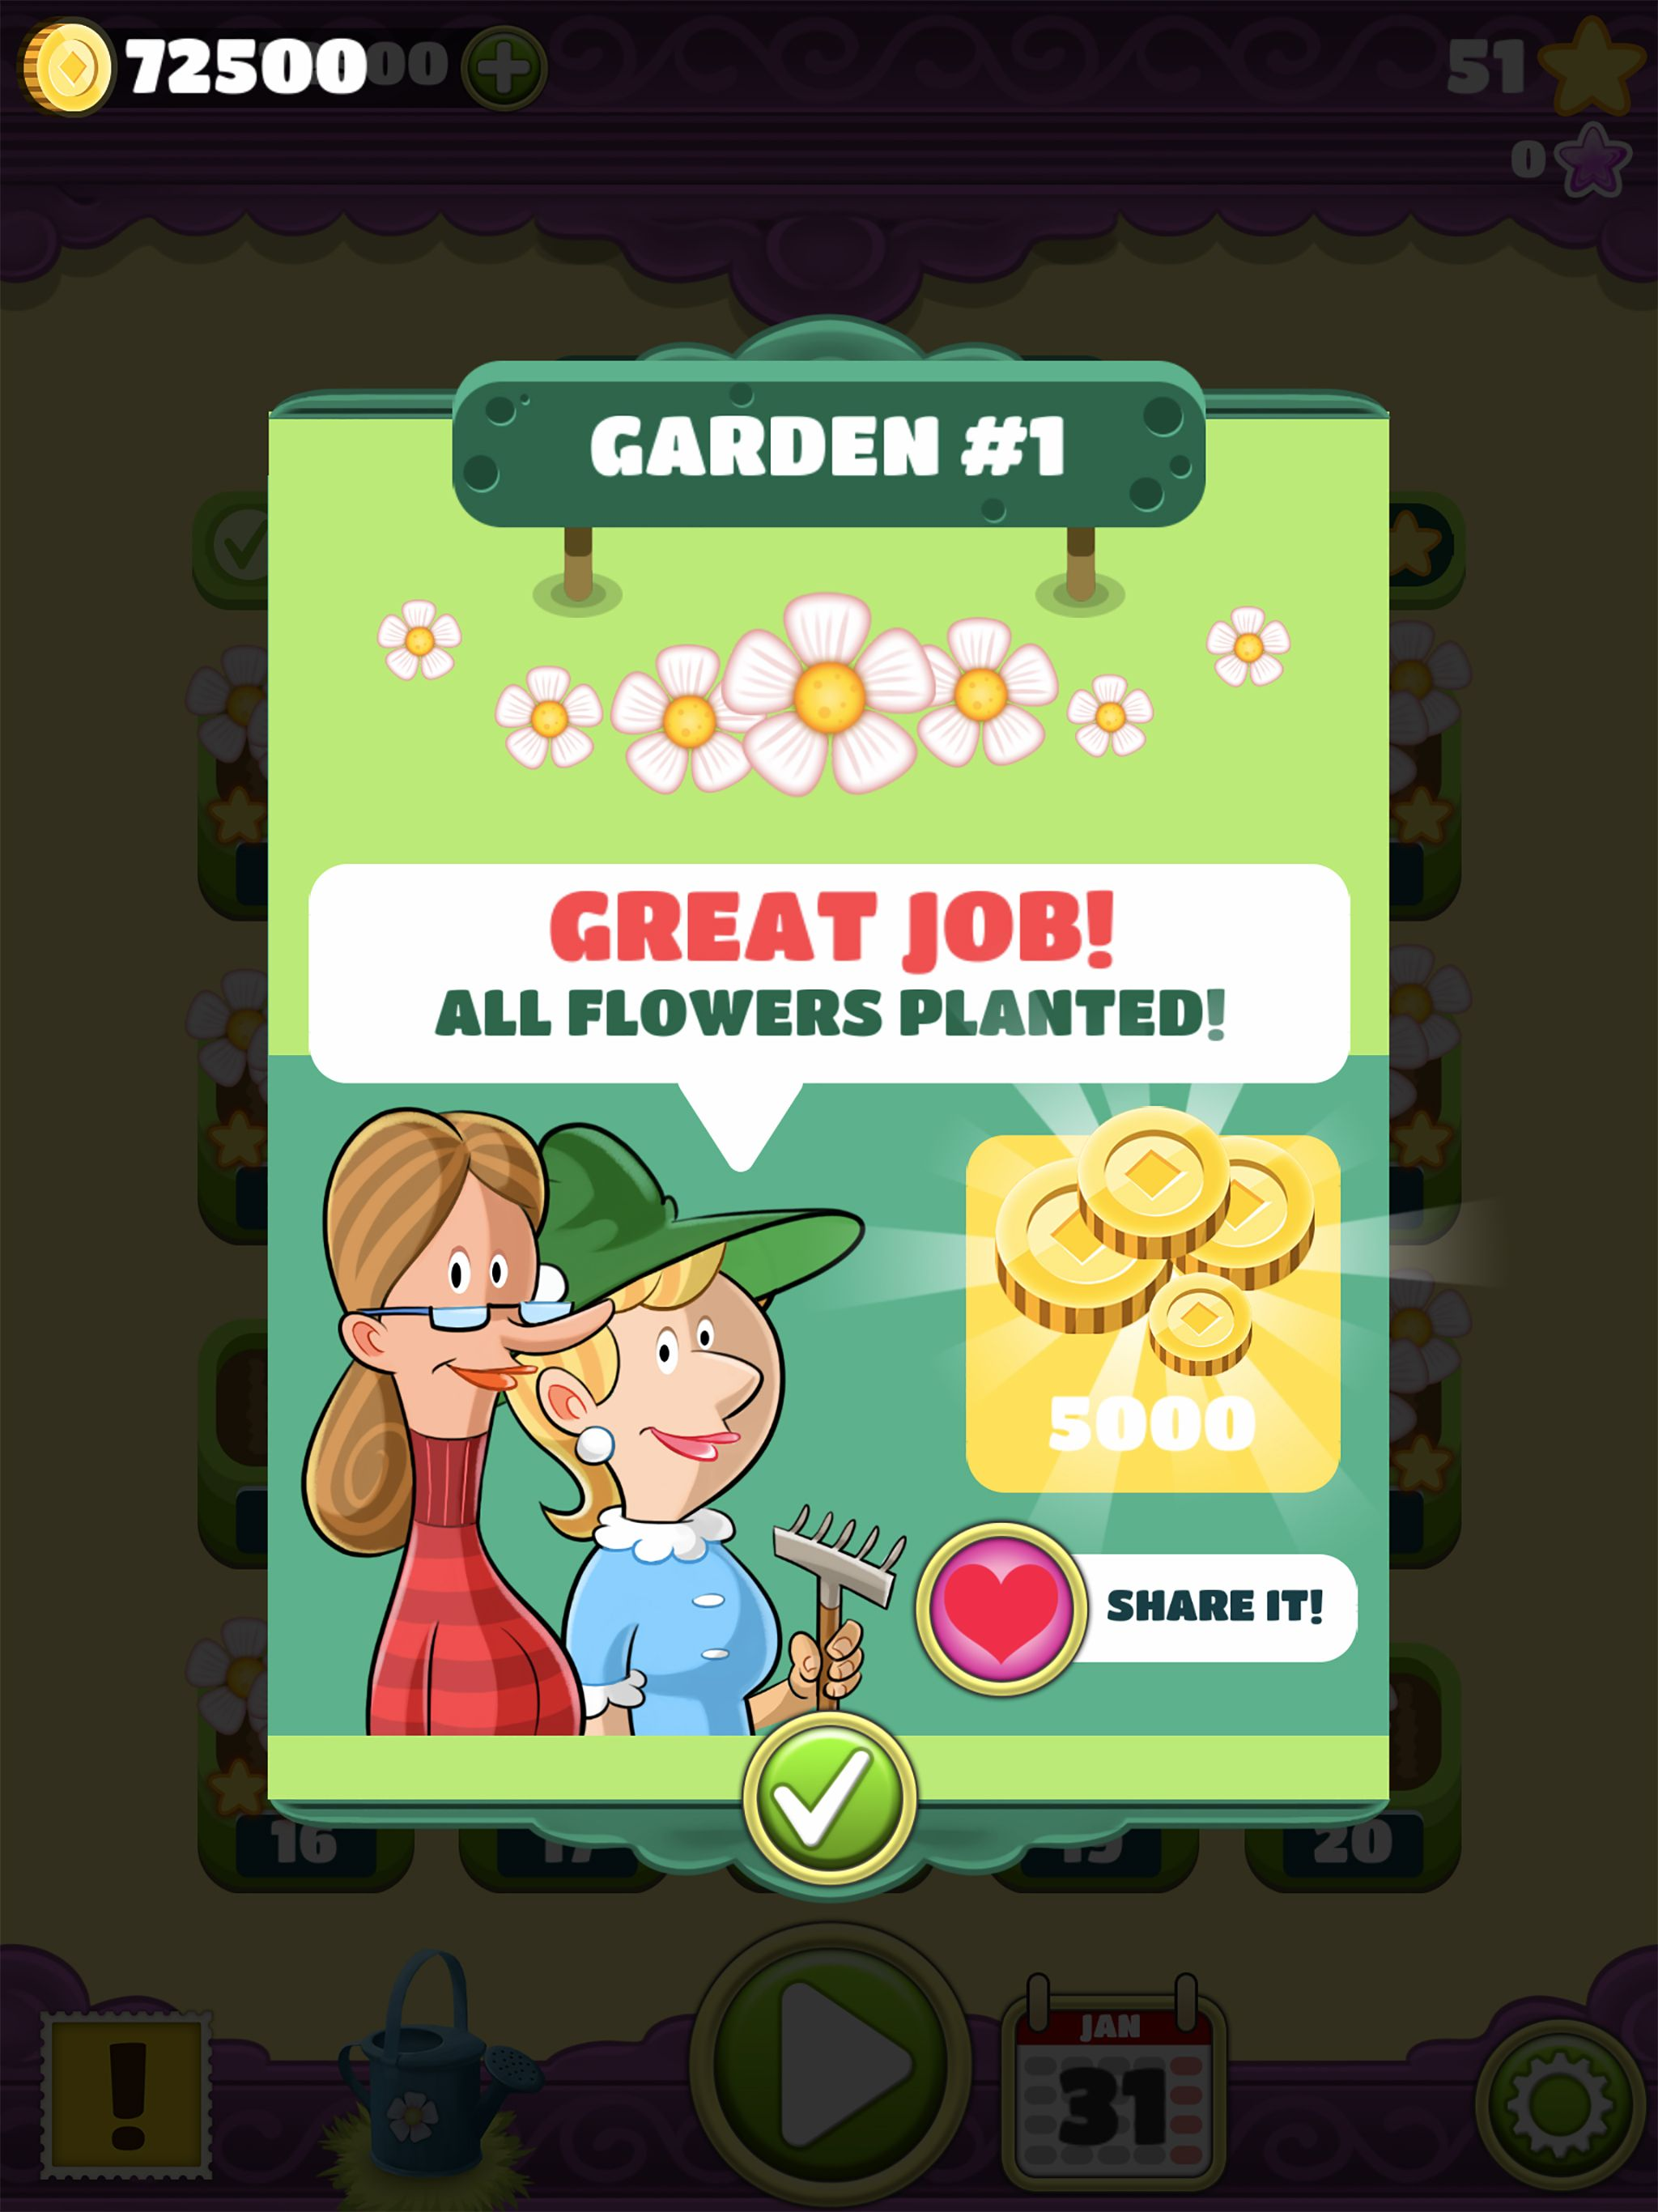 e401fc03ce7ec2f693cf1a33e86b2dd0 - Mahjong Gardens With Birds Free Online